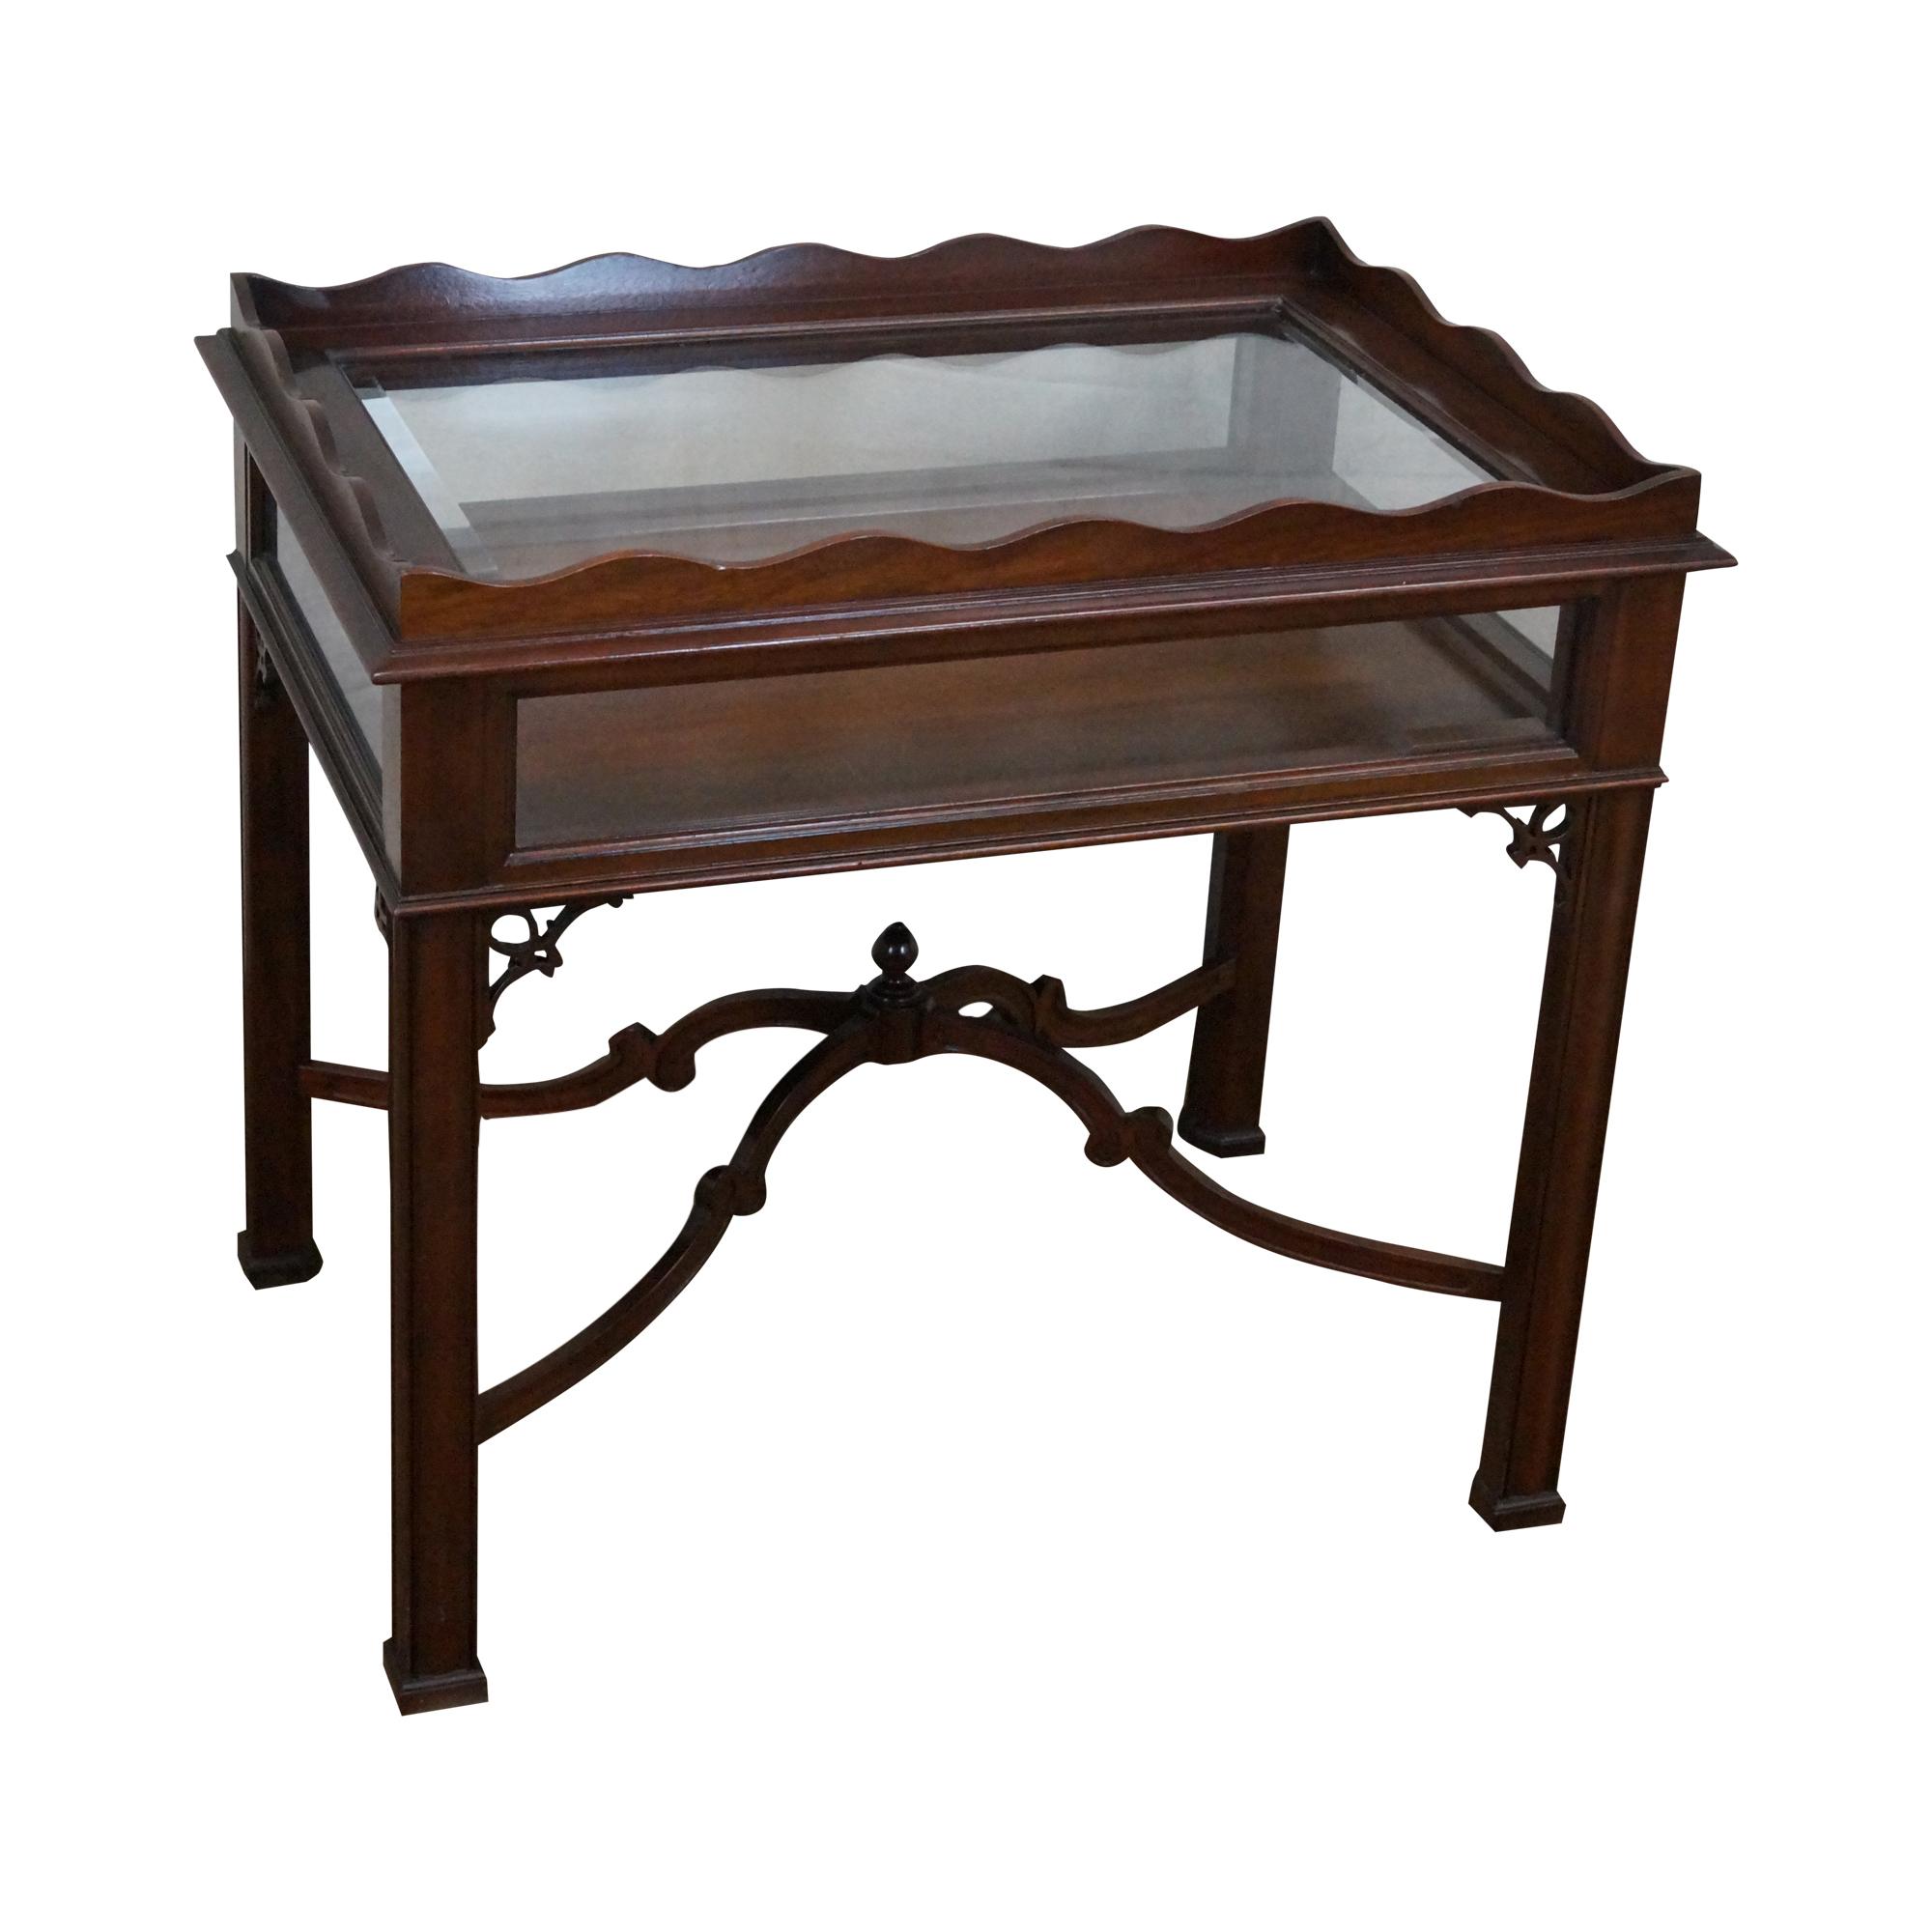 Solid Mahogany Chippendale Curio Top Vitrine Table Chairish